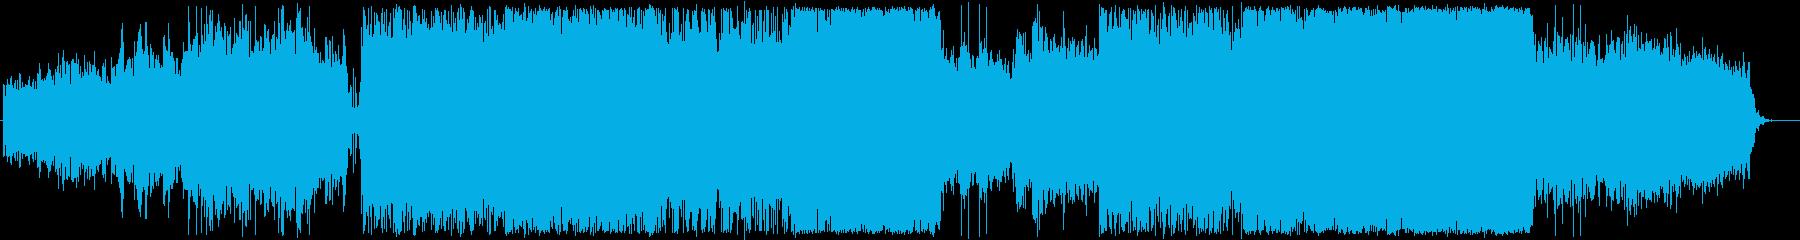 transition 映画のBGMの再生済みの波形